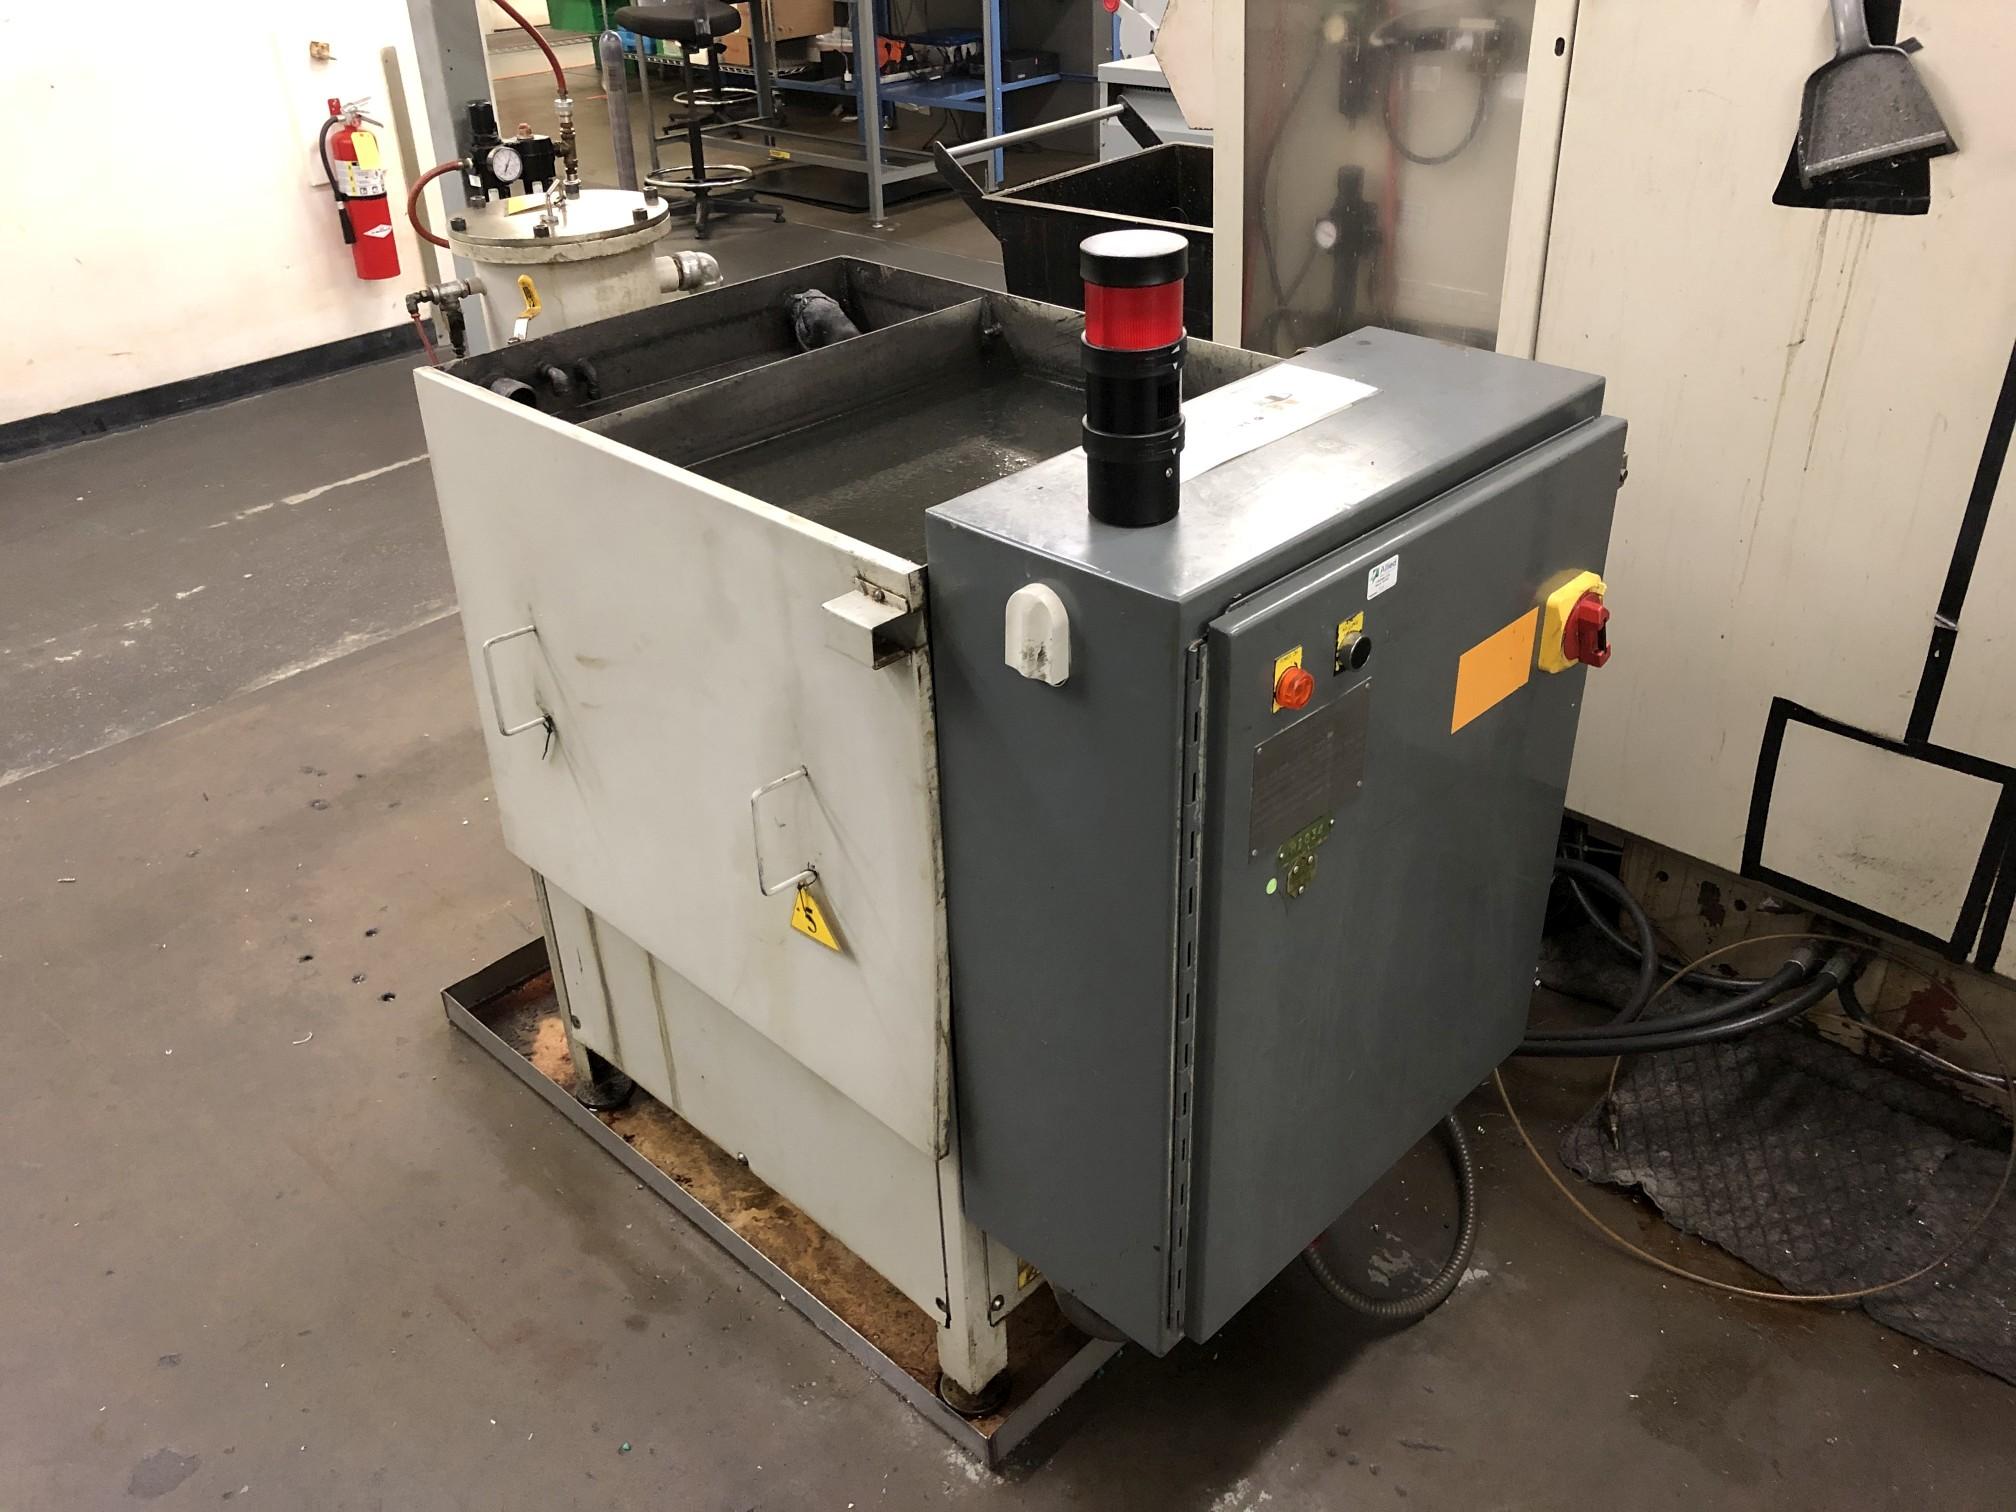 1999 Kitako MT4-200 Multi-Spindle CNC Turning Mill - Image 13 of 16